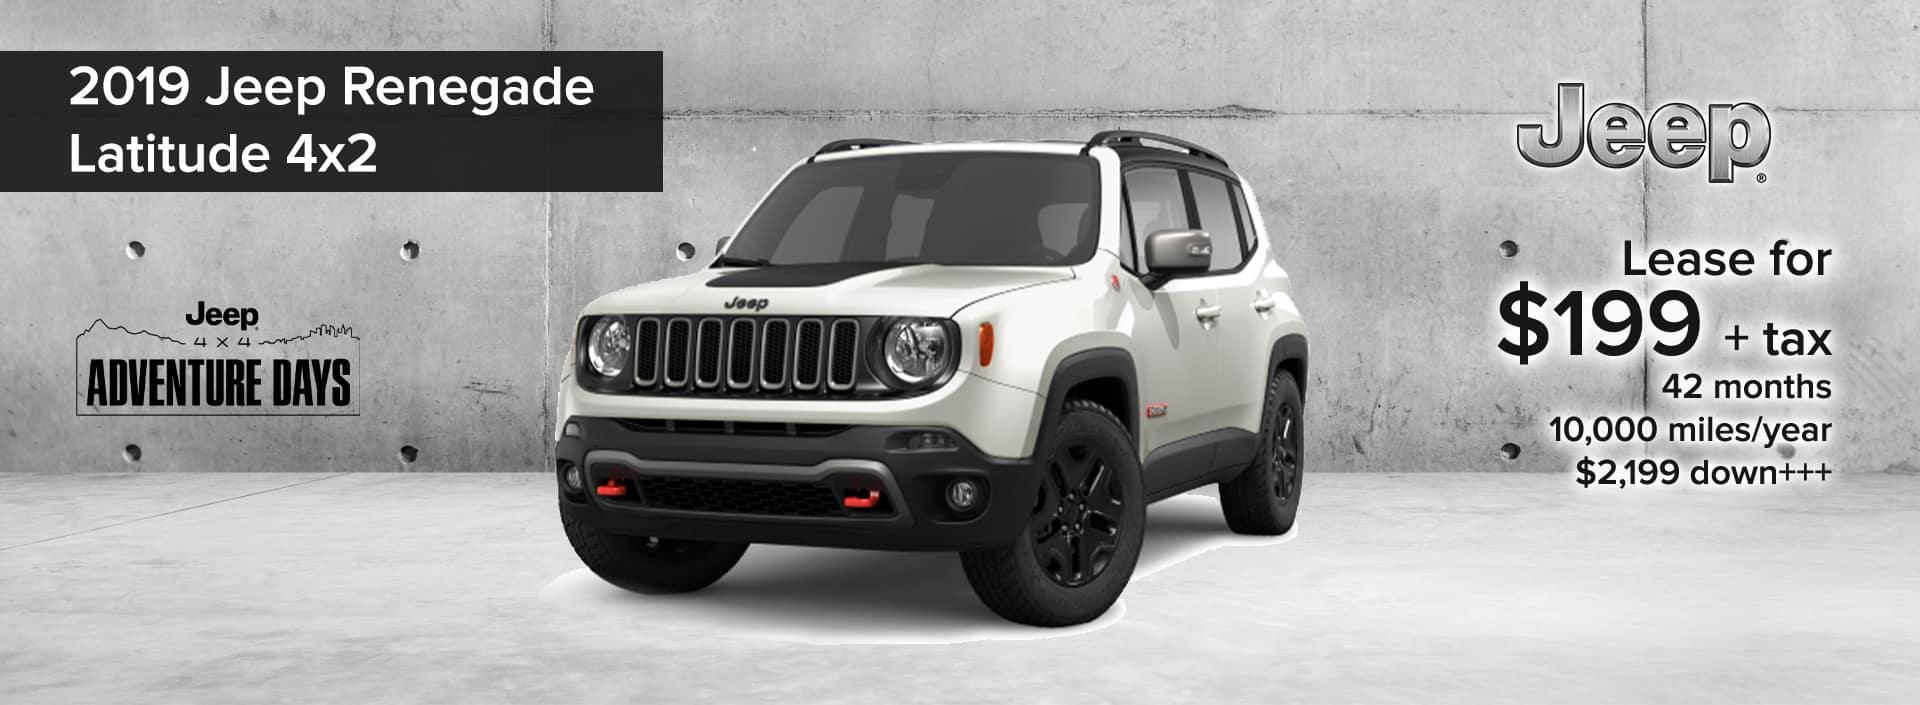 2019 Jeep Renegade Latitude 4x2 Jeep 4x4 Adventure Days Lease Deal